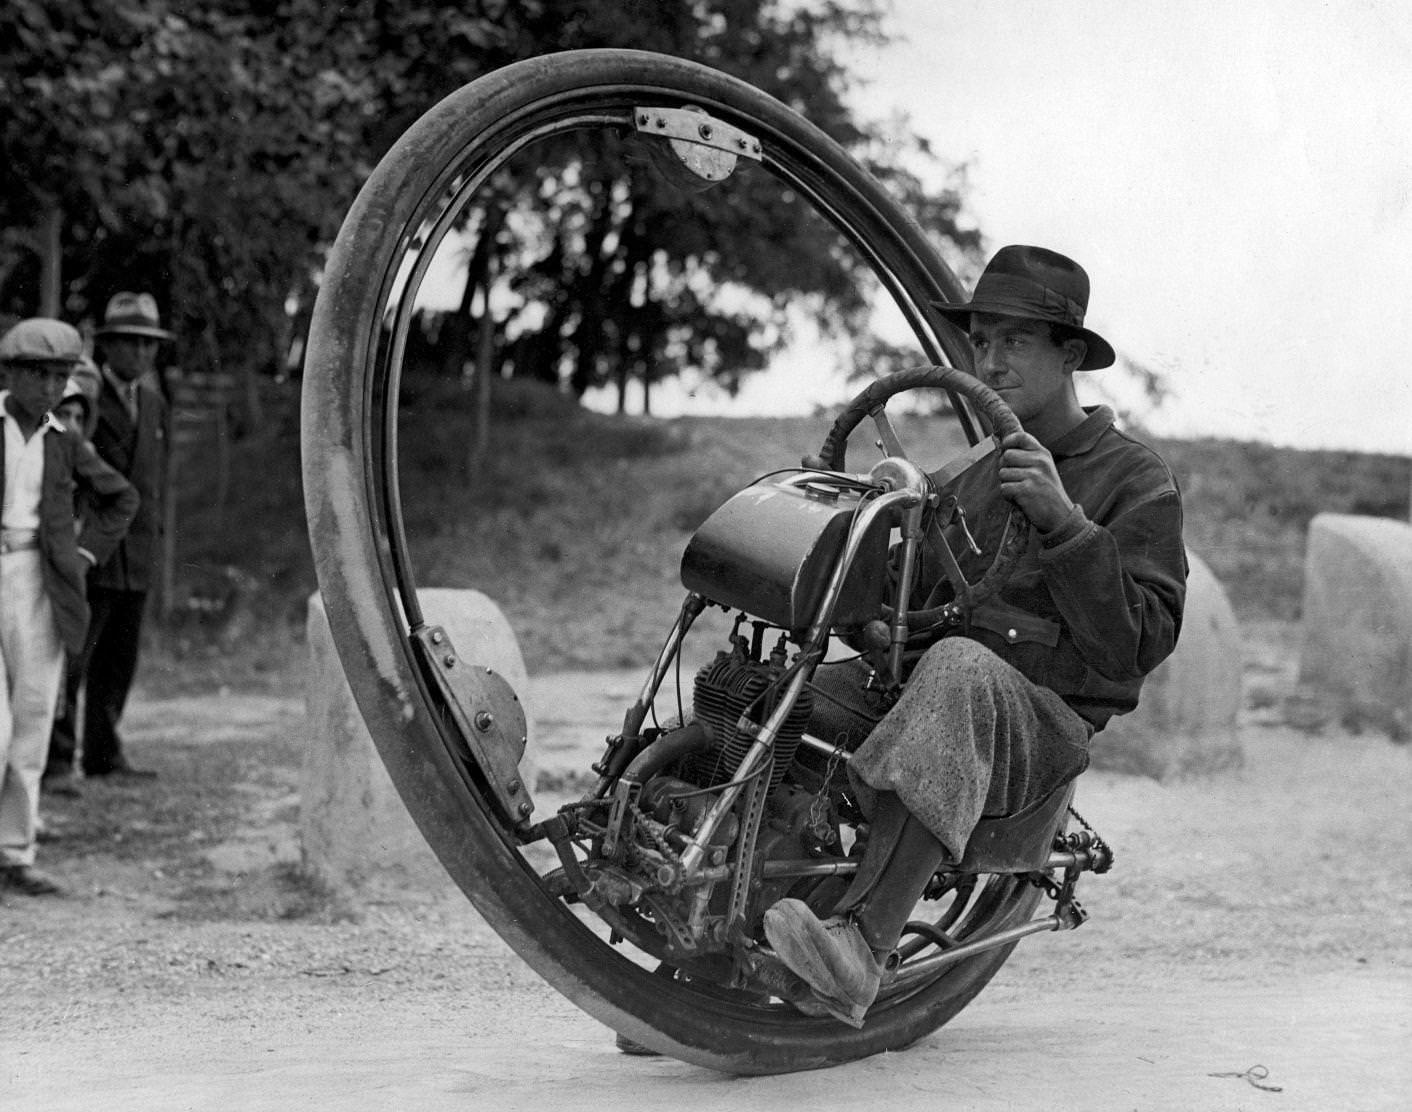 Monowheel built by M. Goventosa